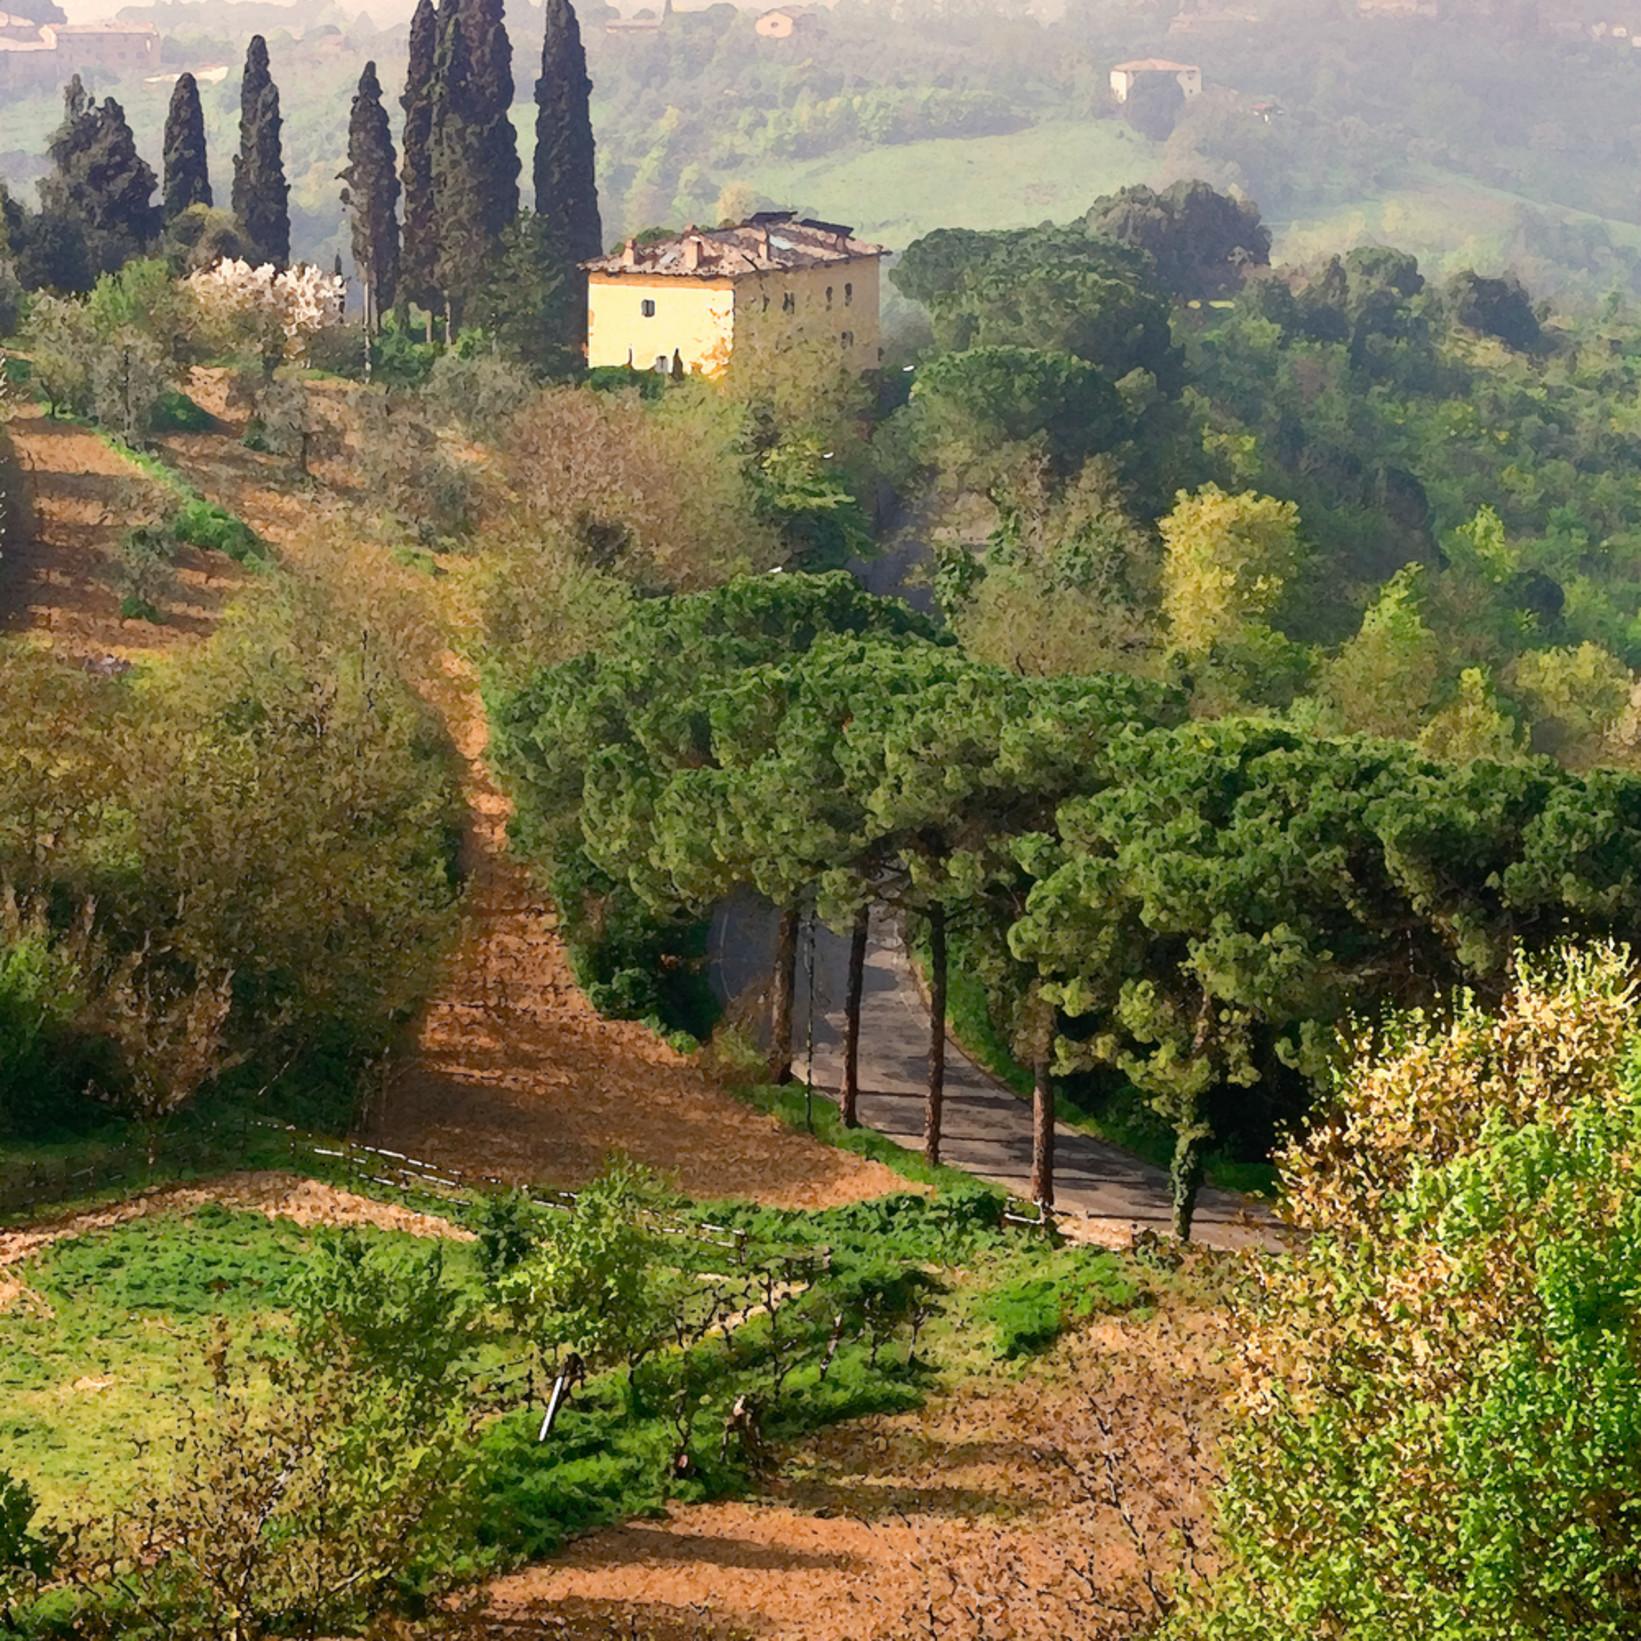 Morning mist tuscany mid9qr